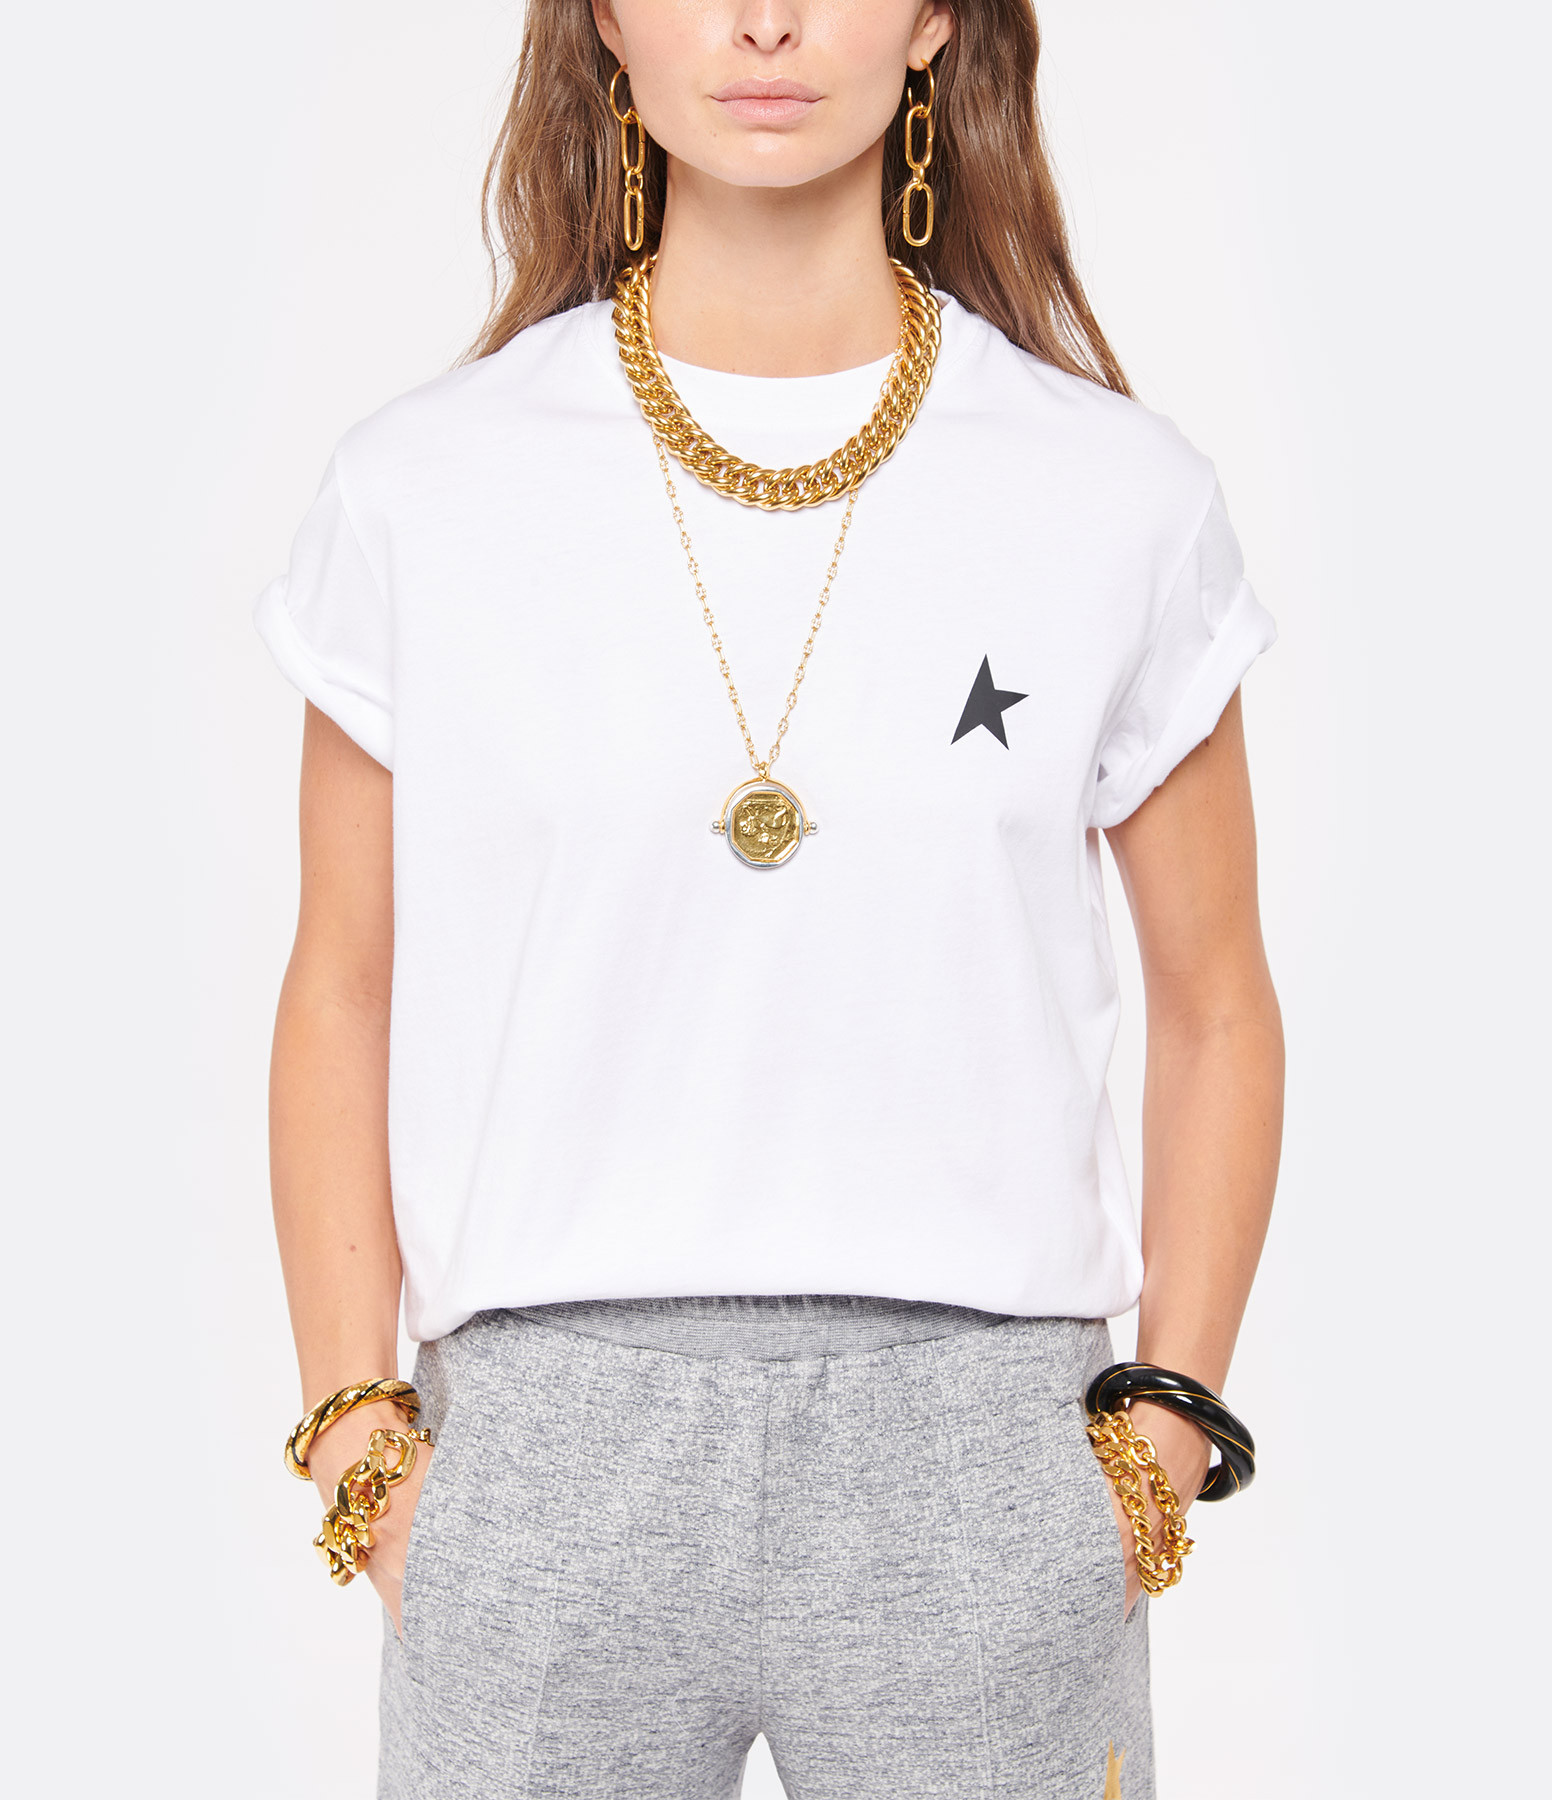 GOLDEN GOOSE - Tee-shirt Golden Étoile Coton Blanc